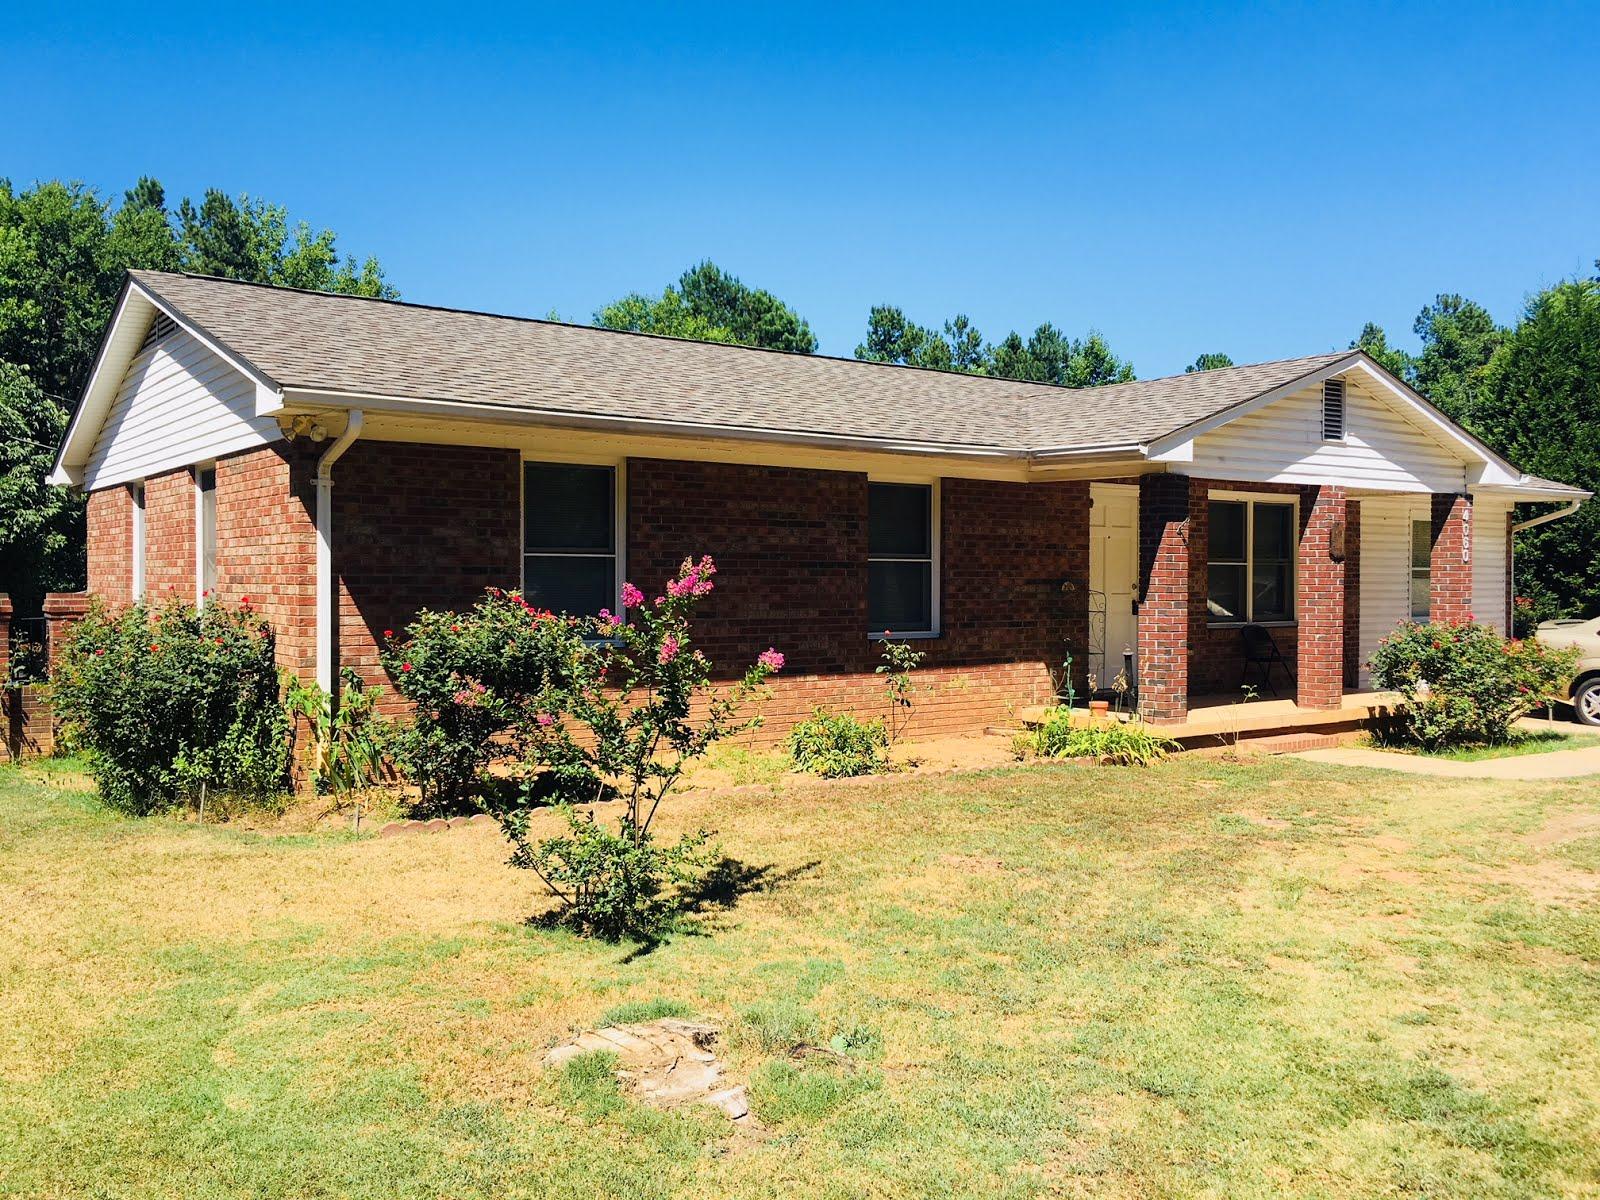 4060 Stokes Ferry Road, Salisbury NC 28146 ~ $125,000